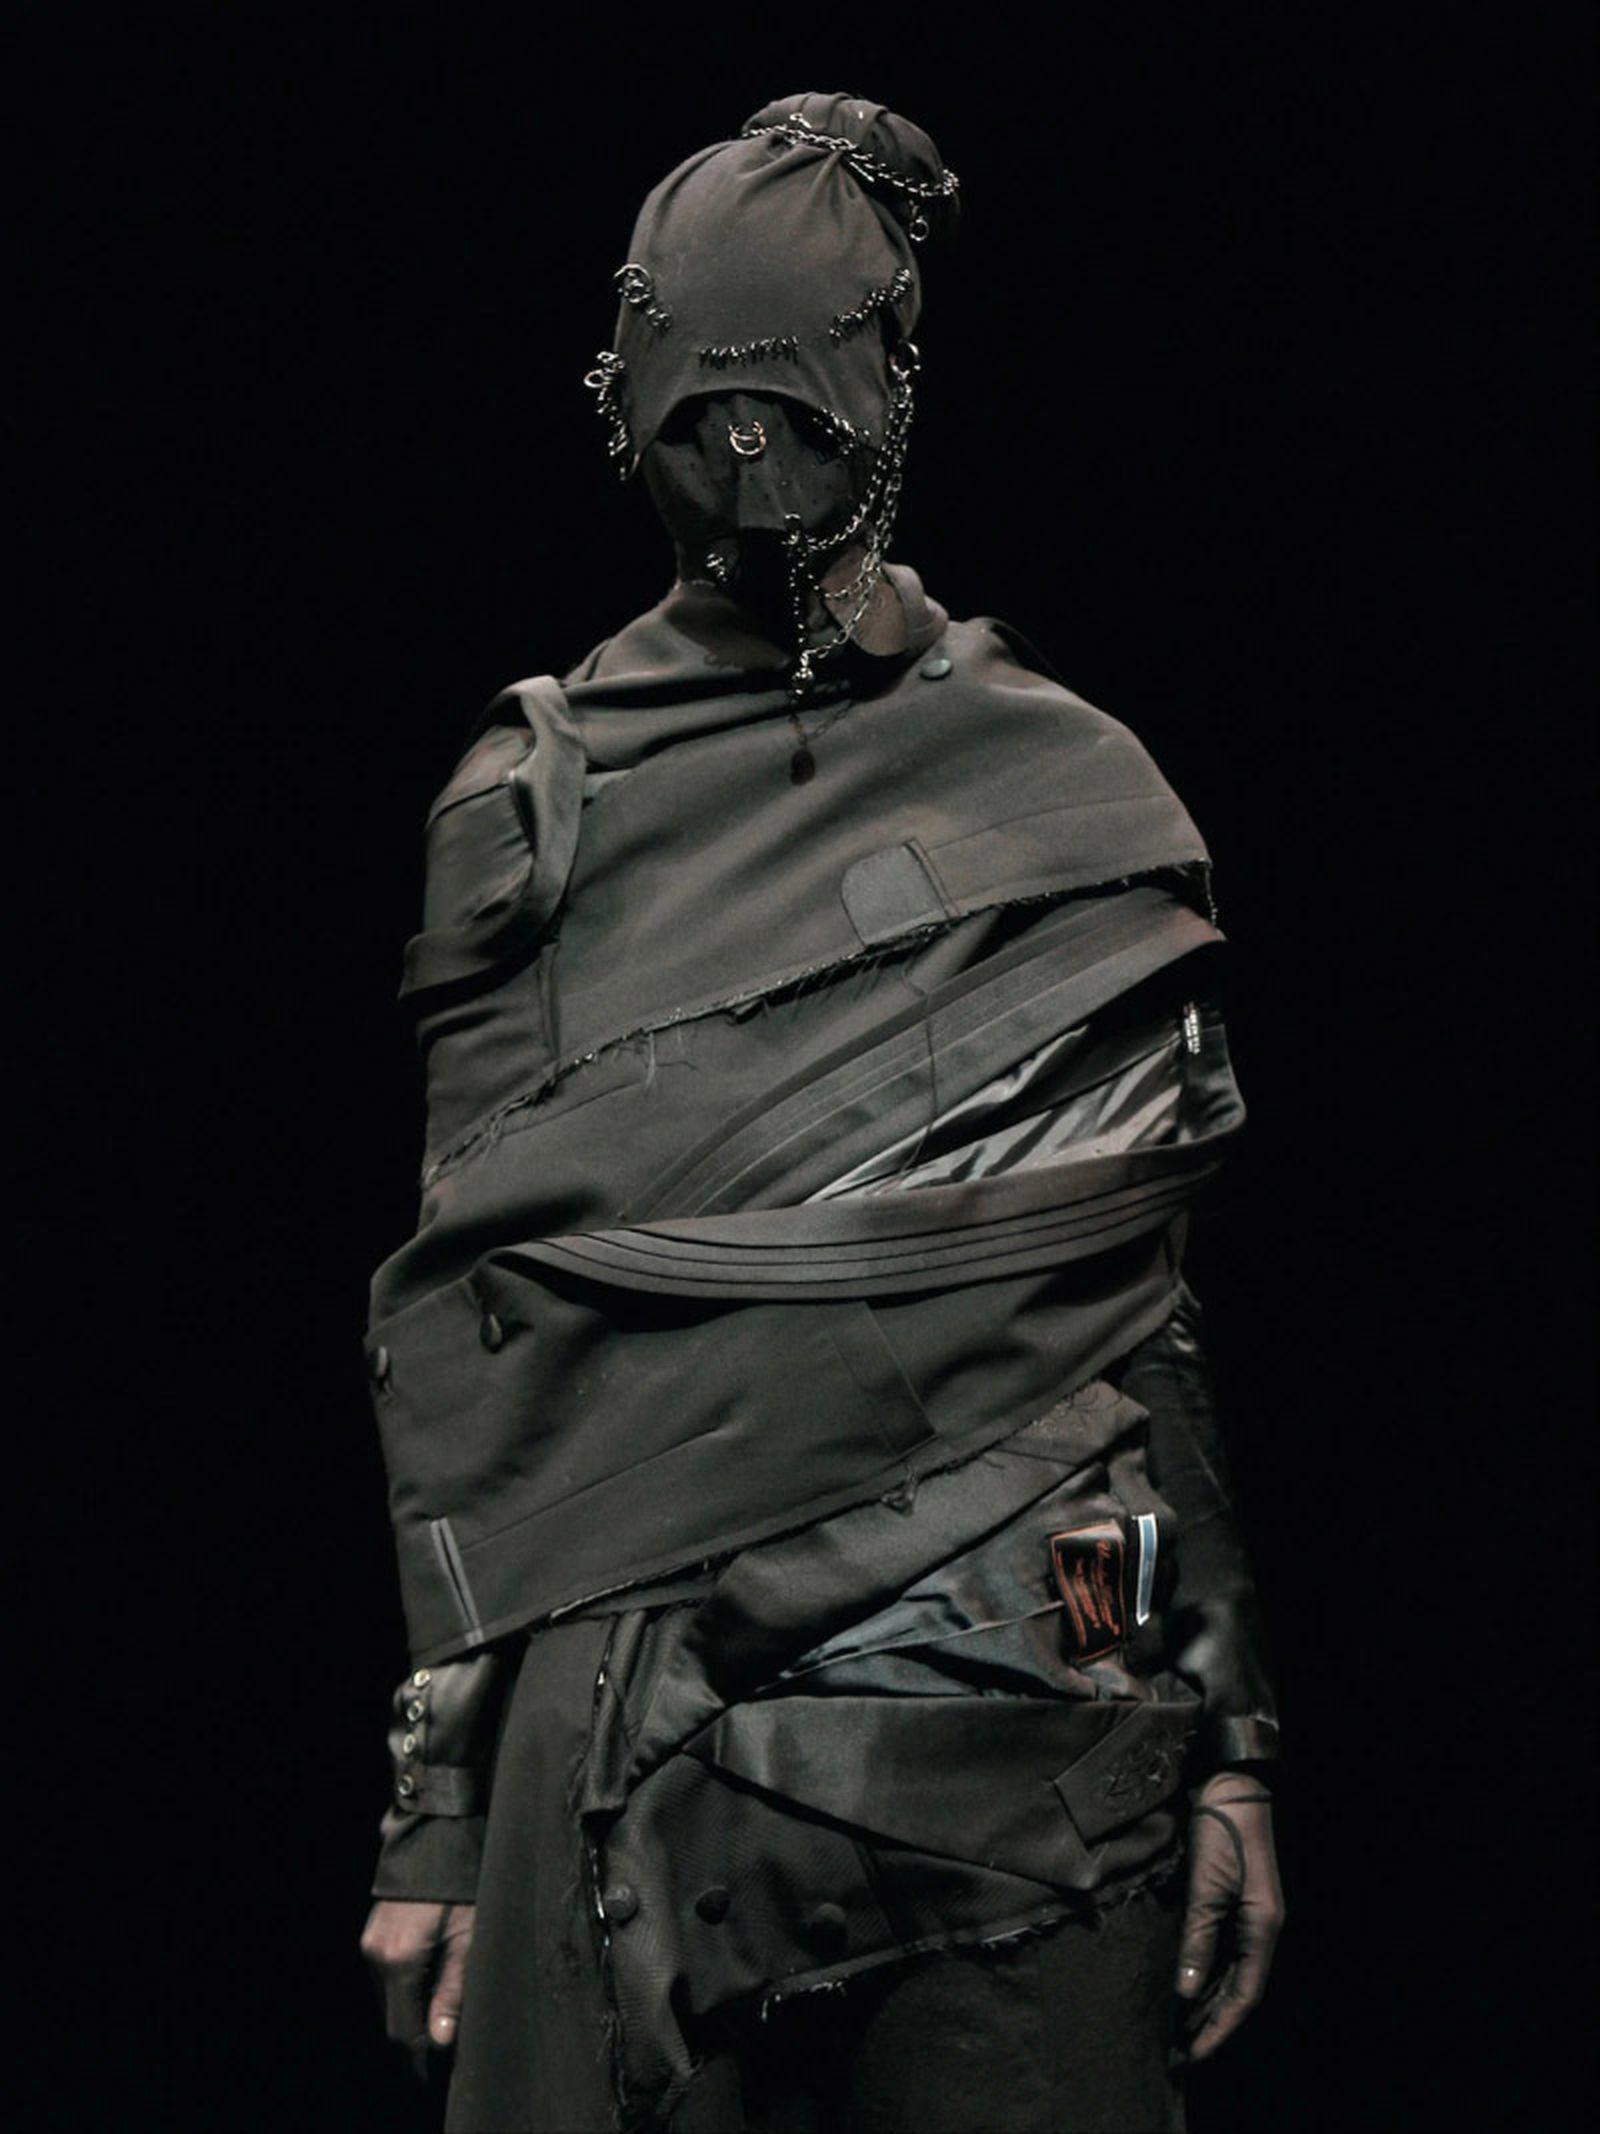 tracing-aesthetic-legacy-slipknot-05